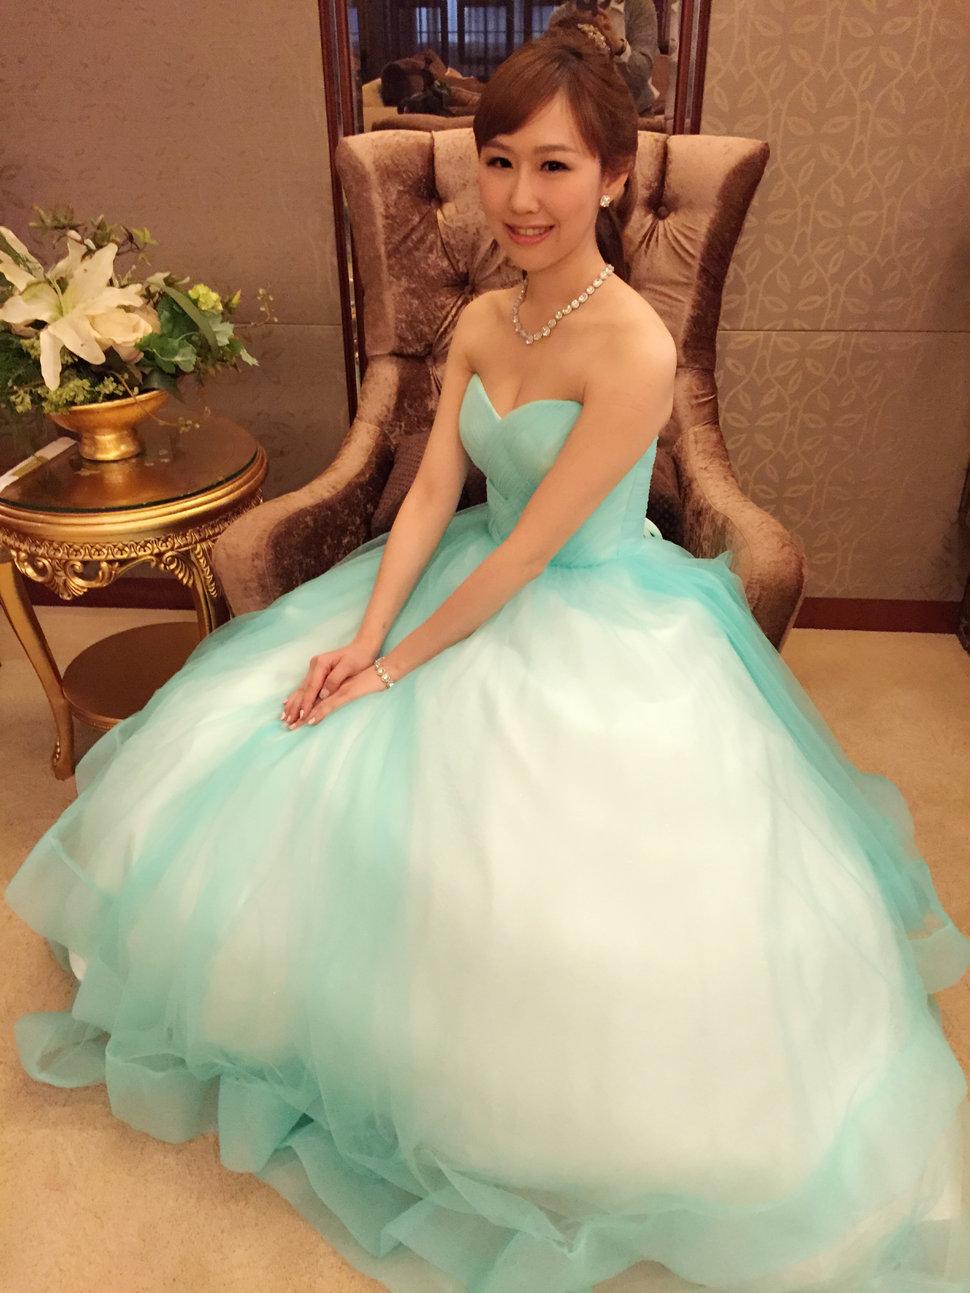 IMG_0439 - Jojo chen Makeup新娘秘書《結婚吧》